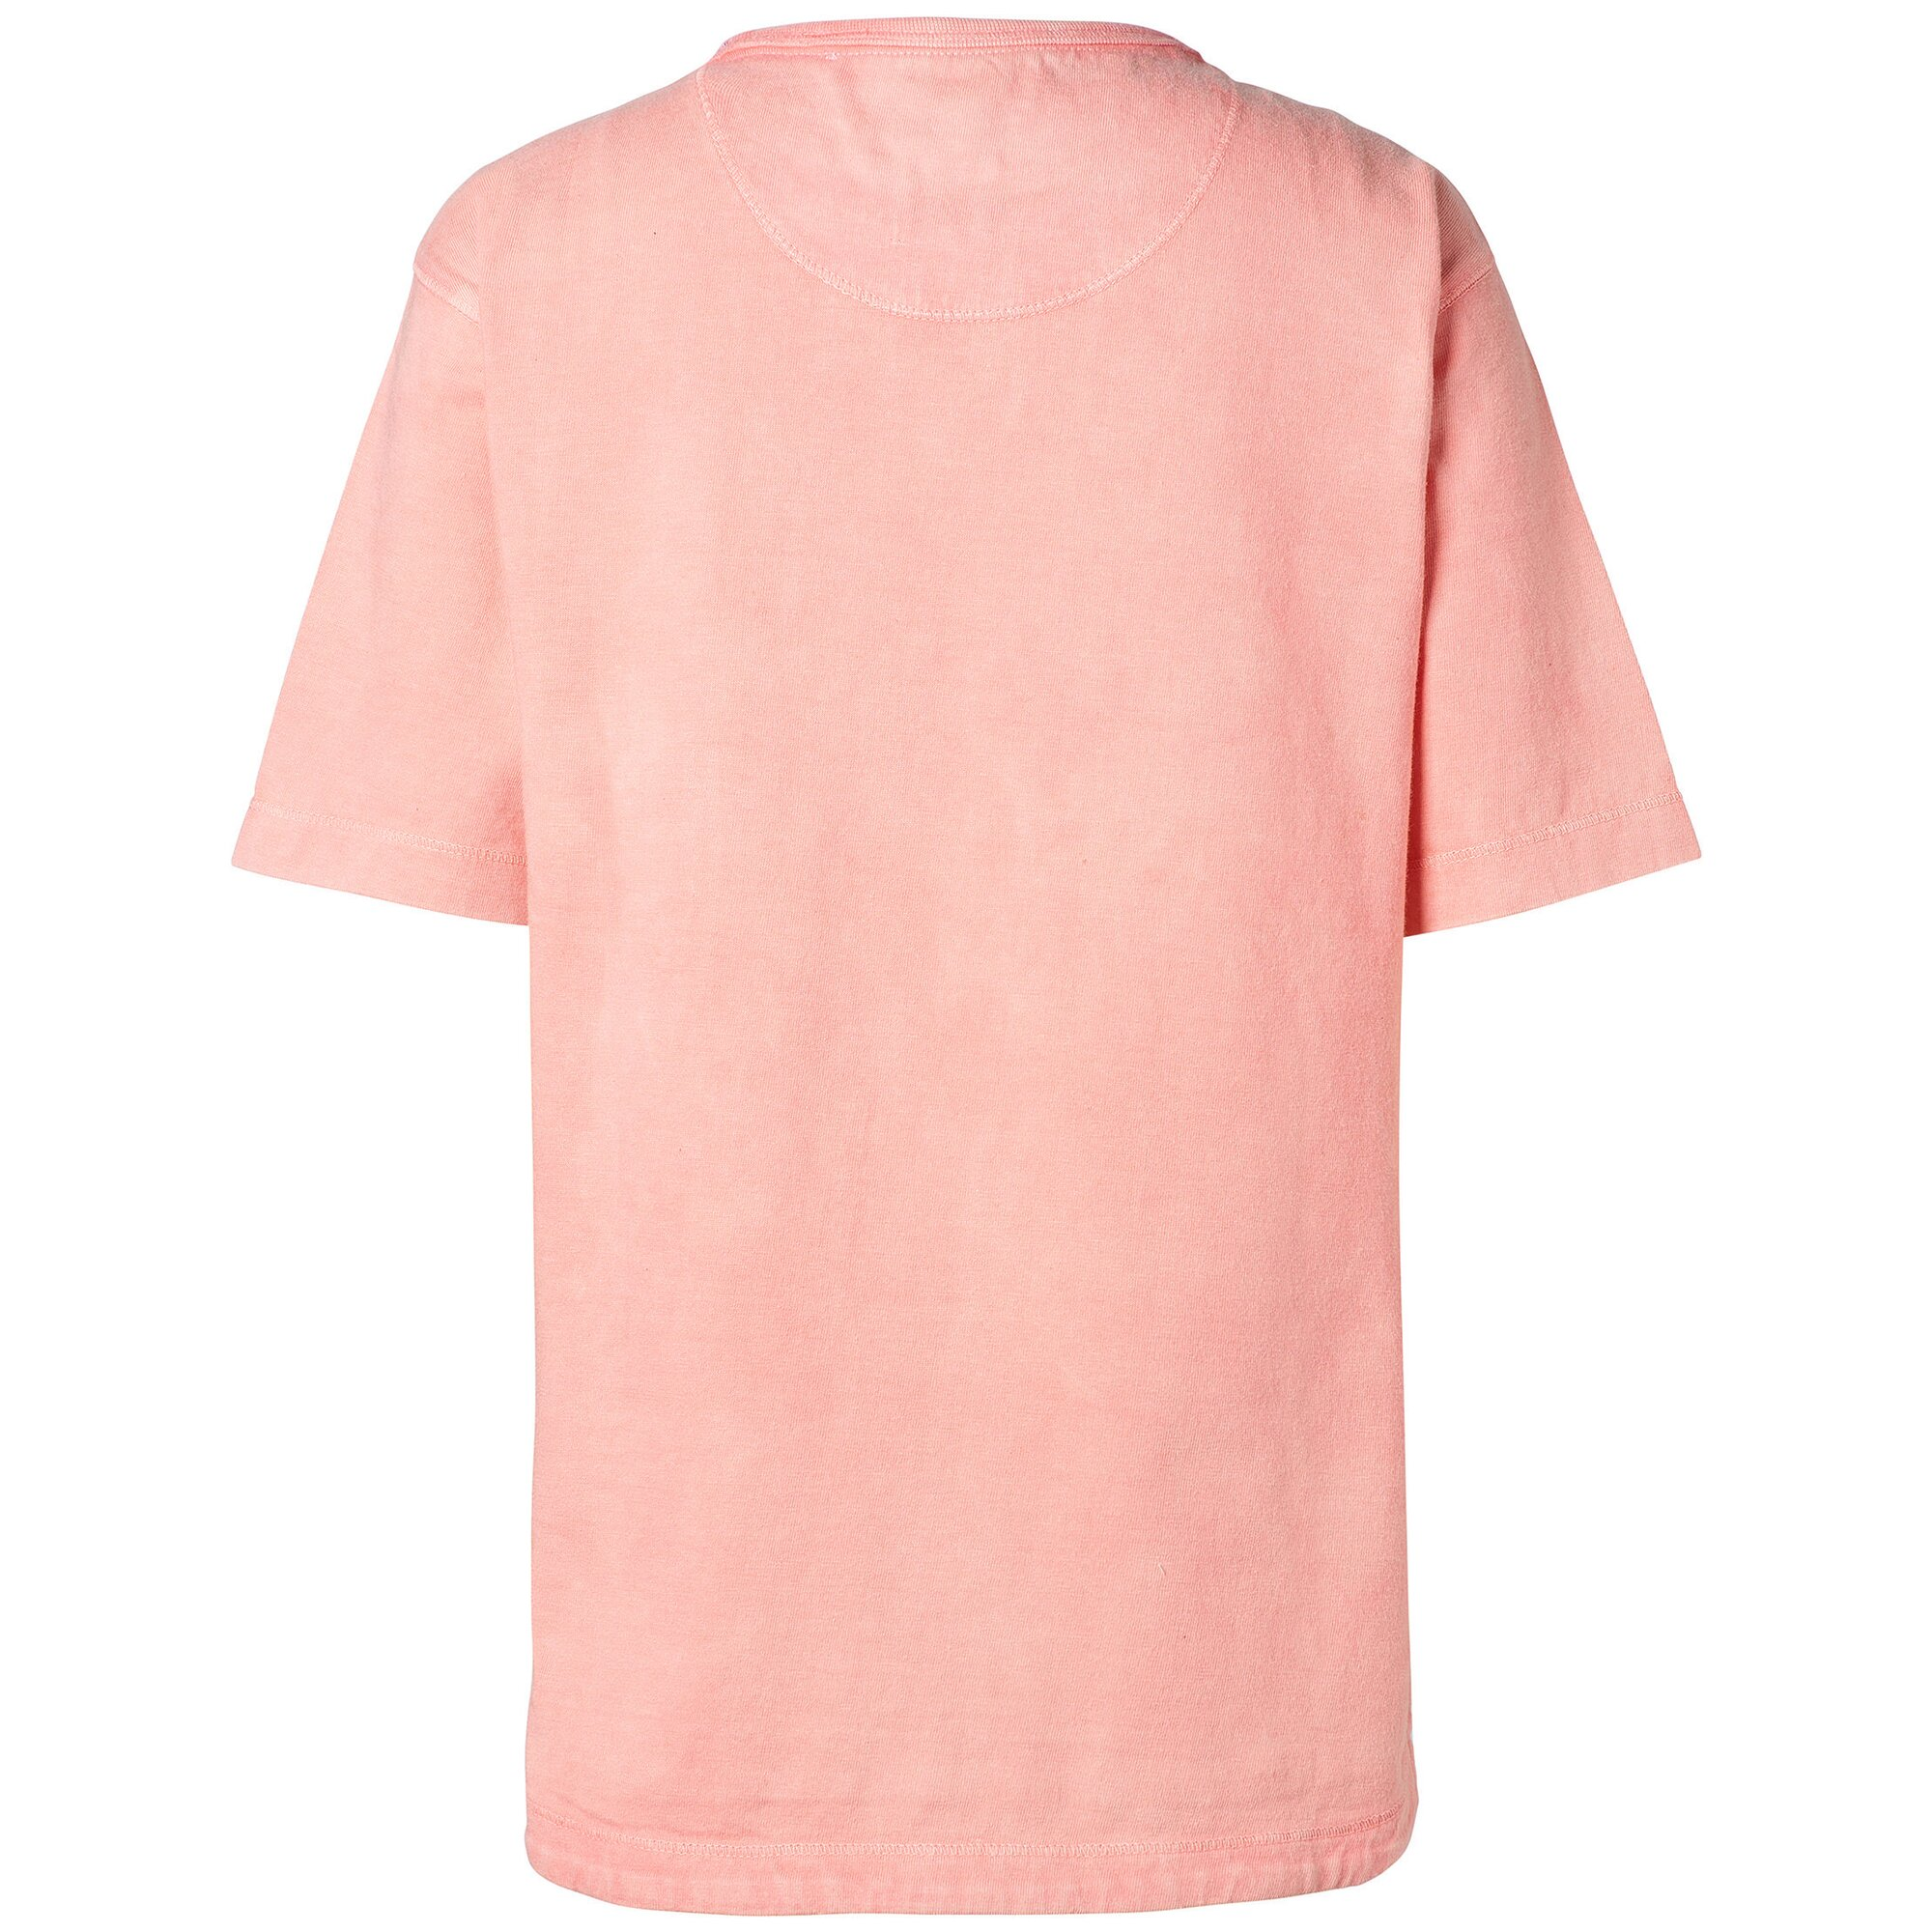 schildkrot-fun-sports-t-shirt-norton, 29.99 EUR @ babywalz-de